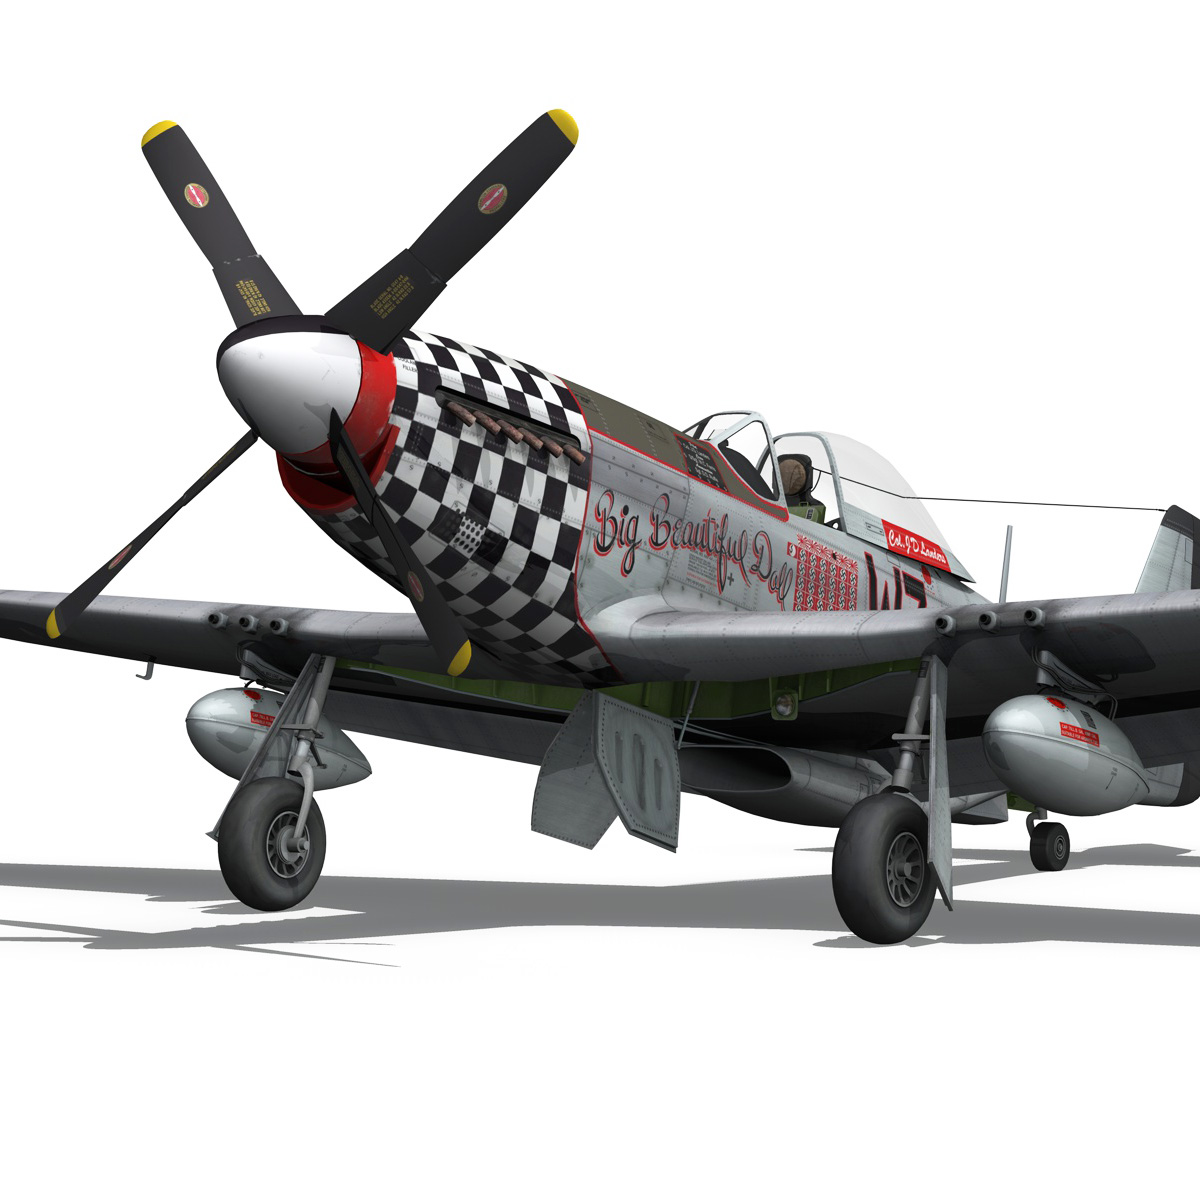 north american p-51d mustang – big beautiful doll 3d model fbx c4d lwo obj 282561